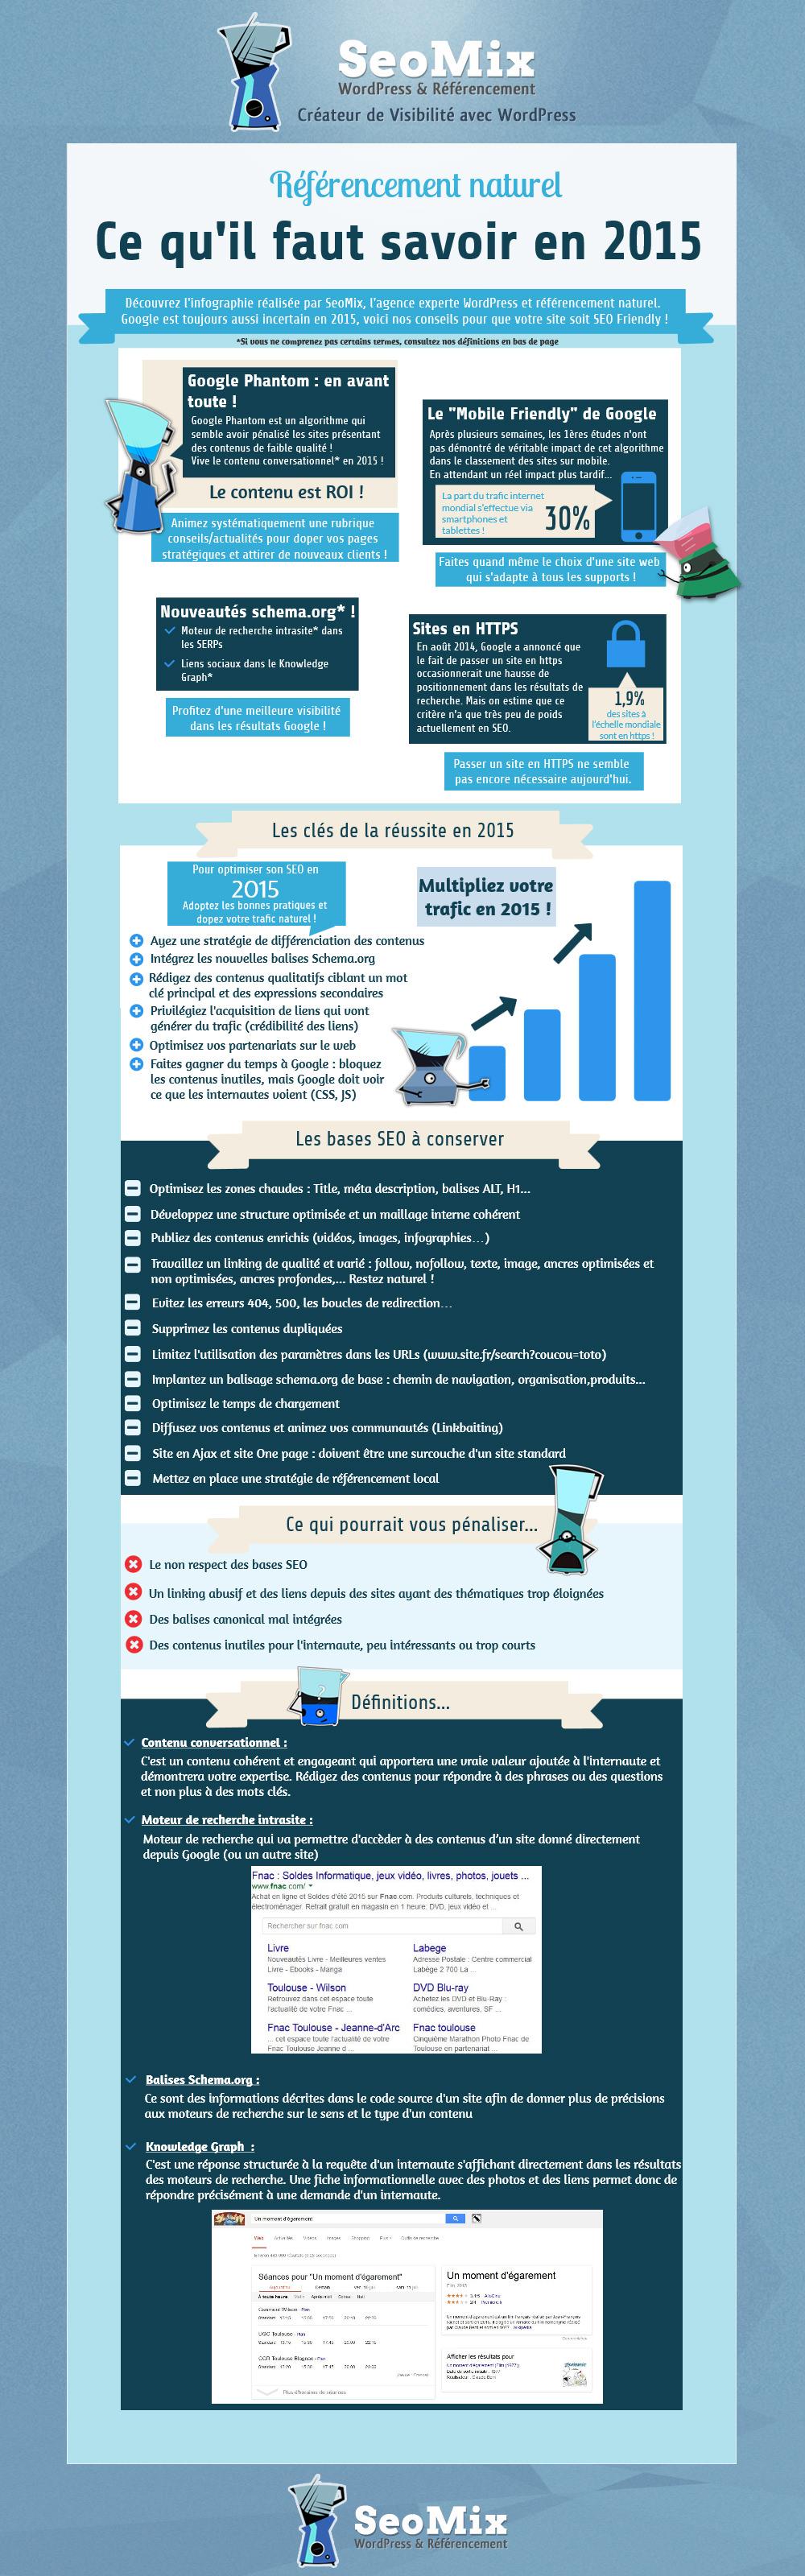 infographie-seomix-seo-2015